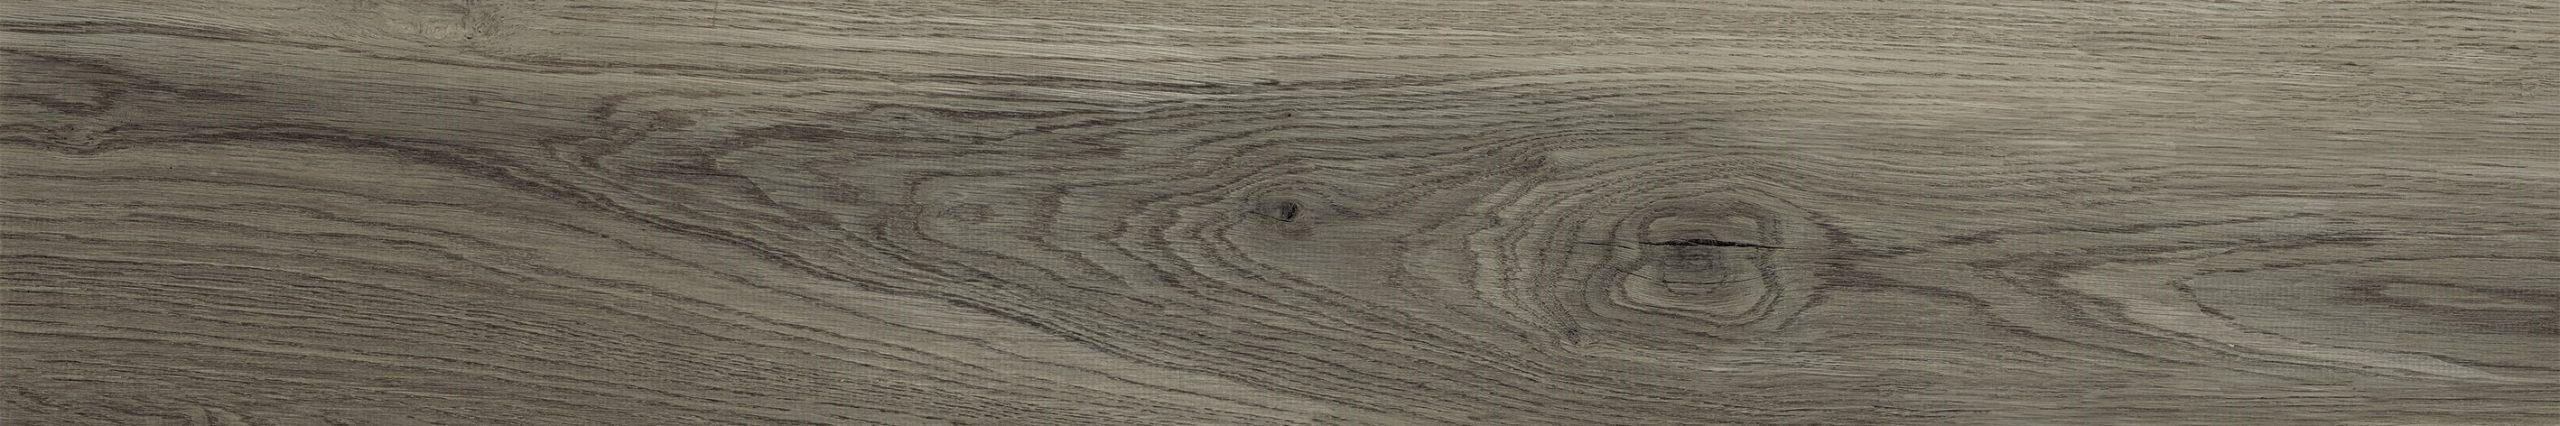 Hi-Wood Dark Oak Matte 10mm 20 x 120